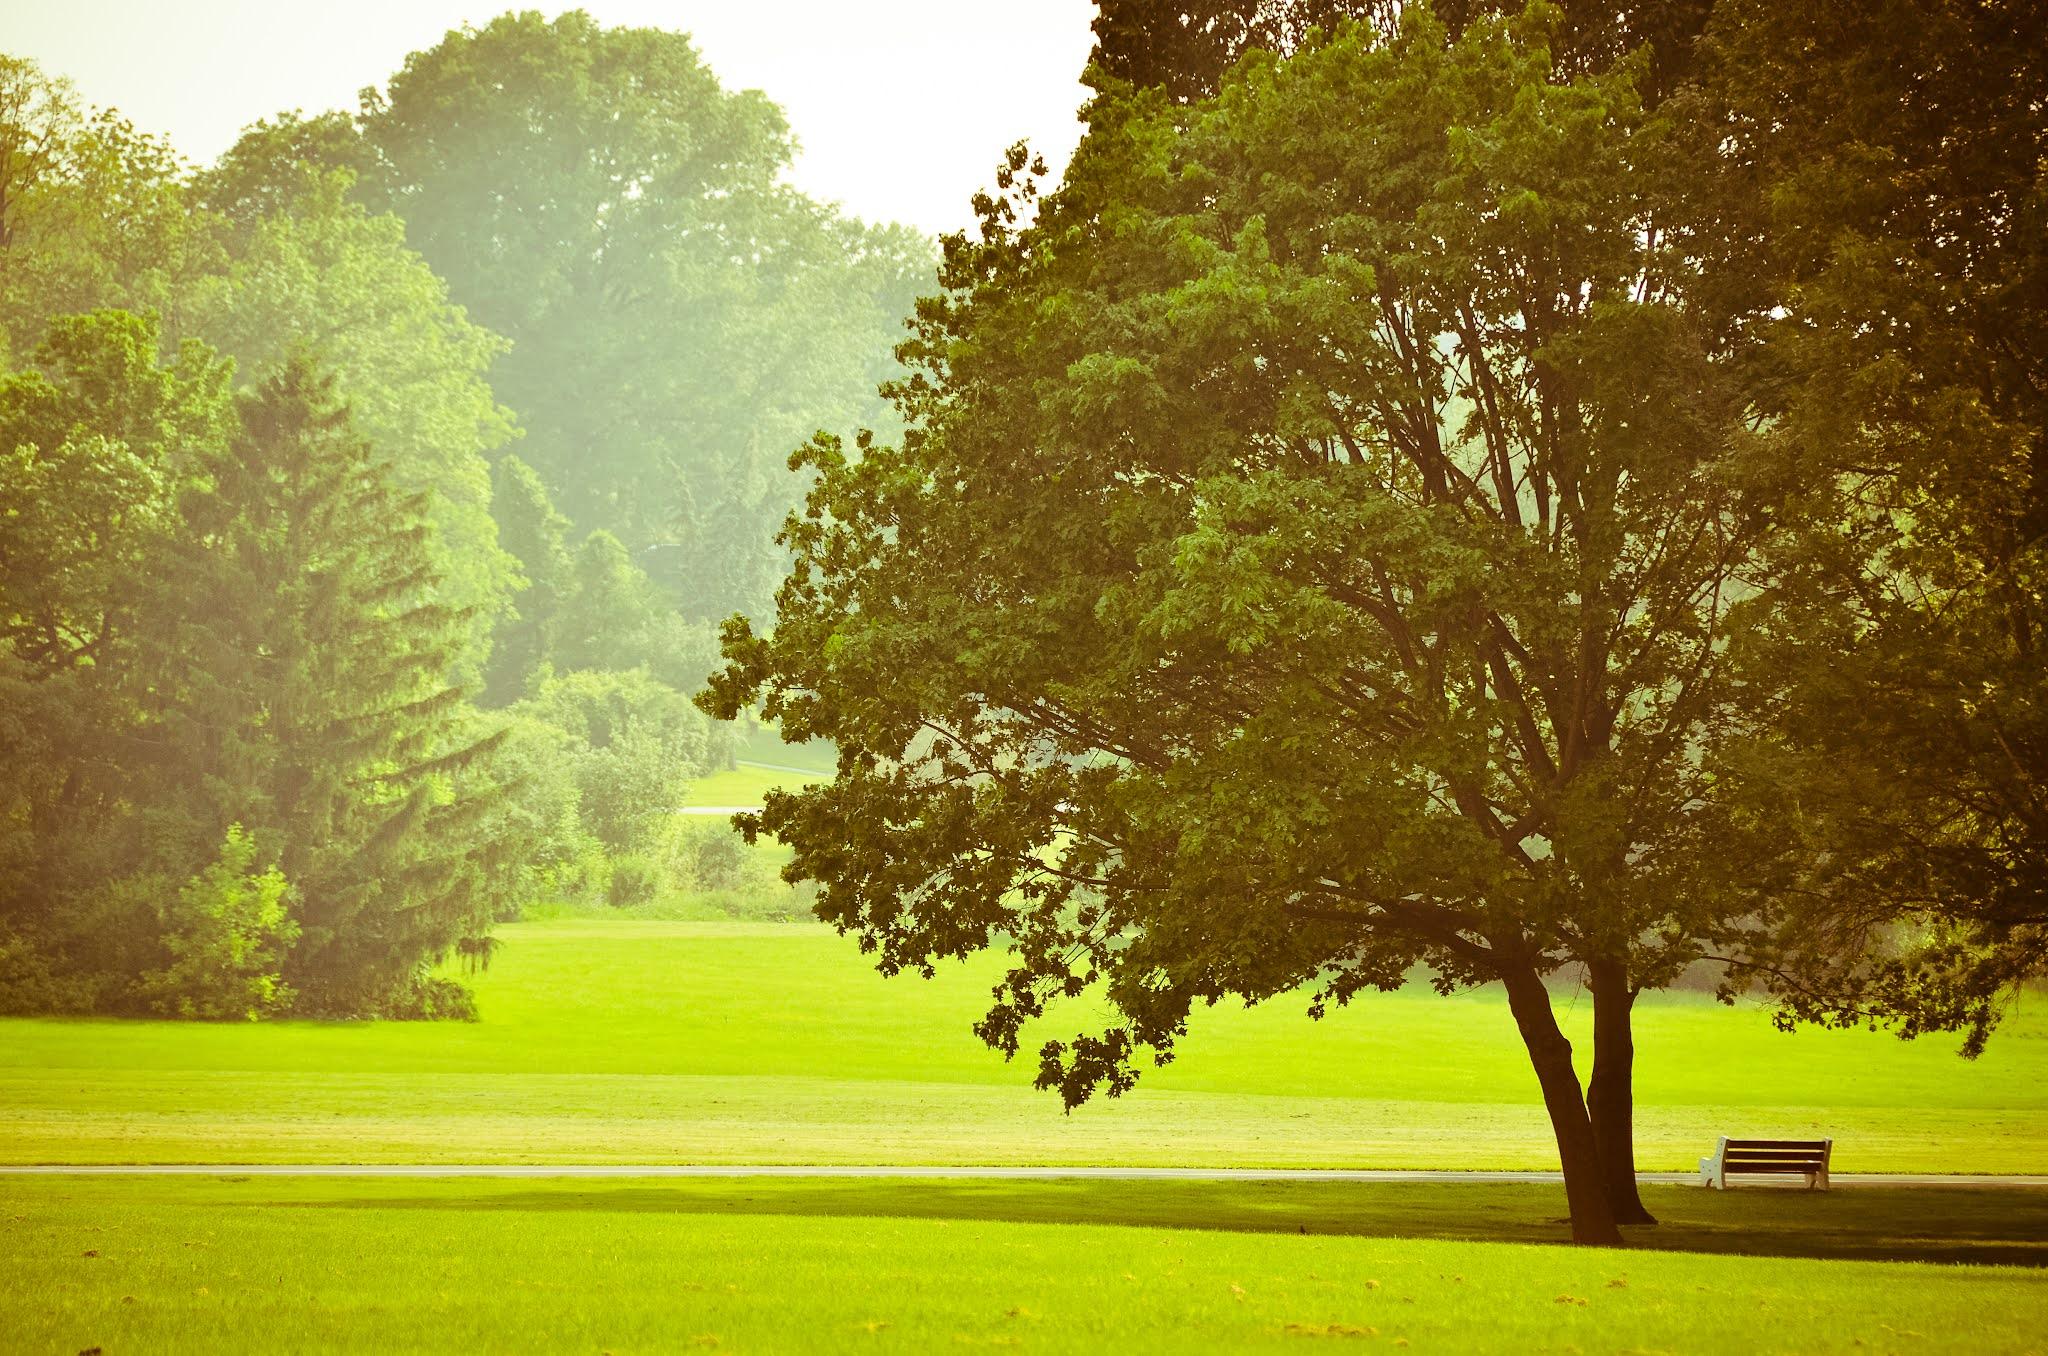 Trexler Park, Allentown, PA